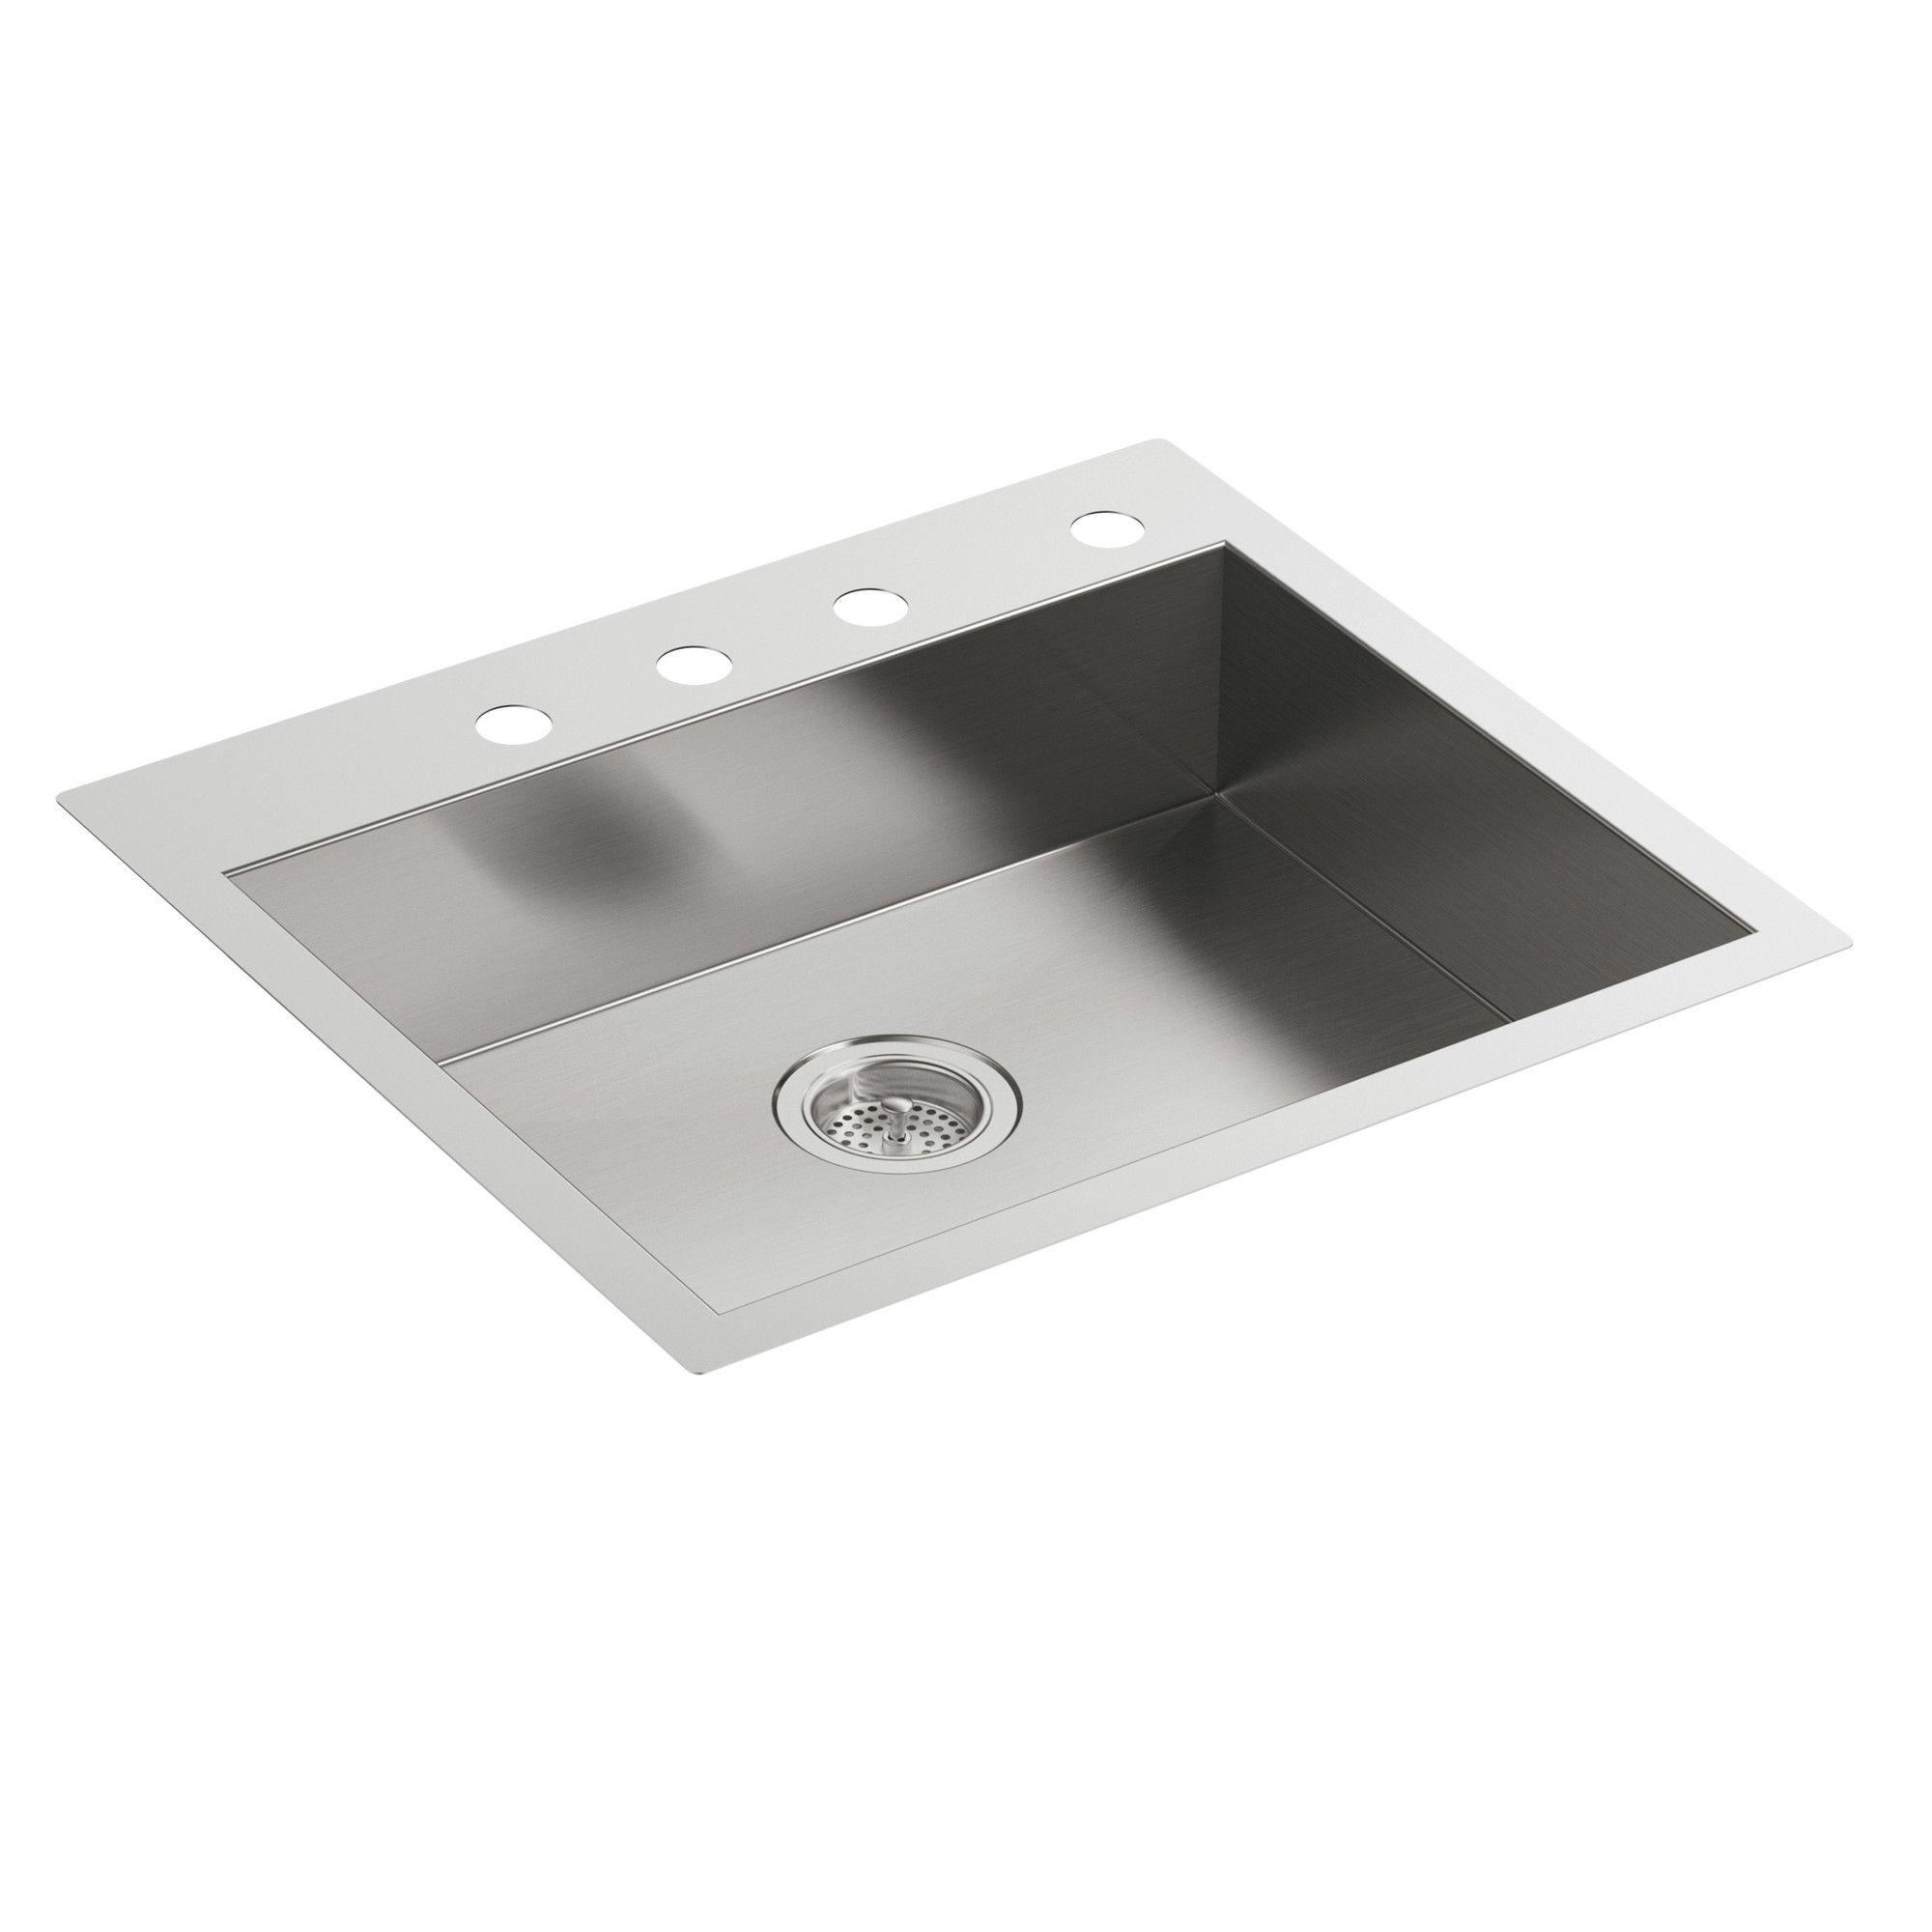 Vault 25 L X 22 W X 6 5 16 Single Bowl Dual Mount Kitchen Sink With 4 Faucet Holes Sink Kitchen Sink Single Bowl Kitchen Sink